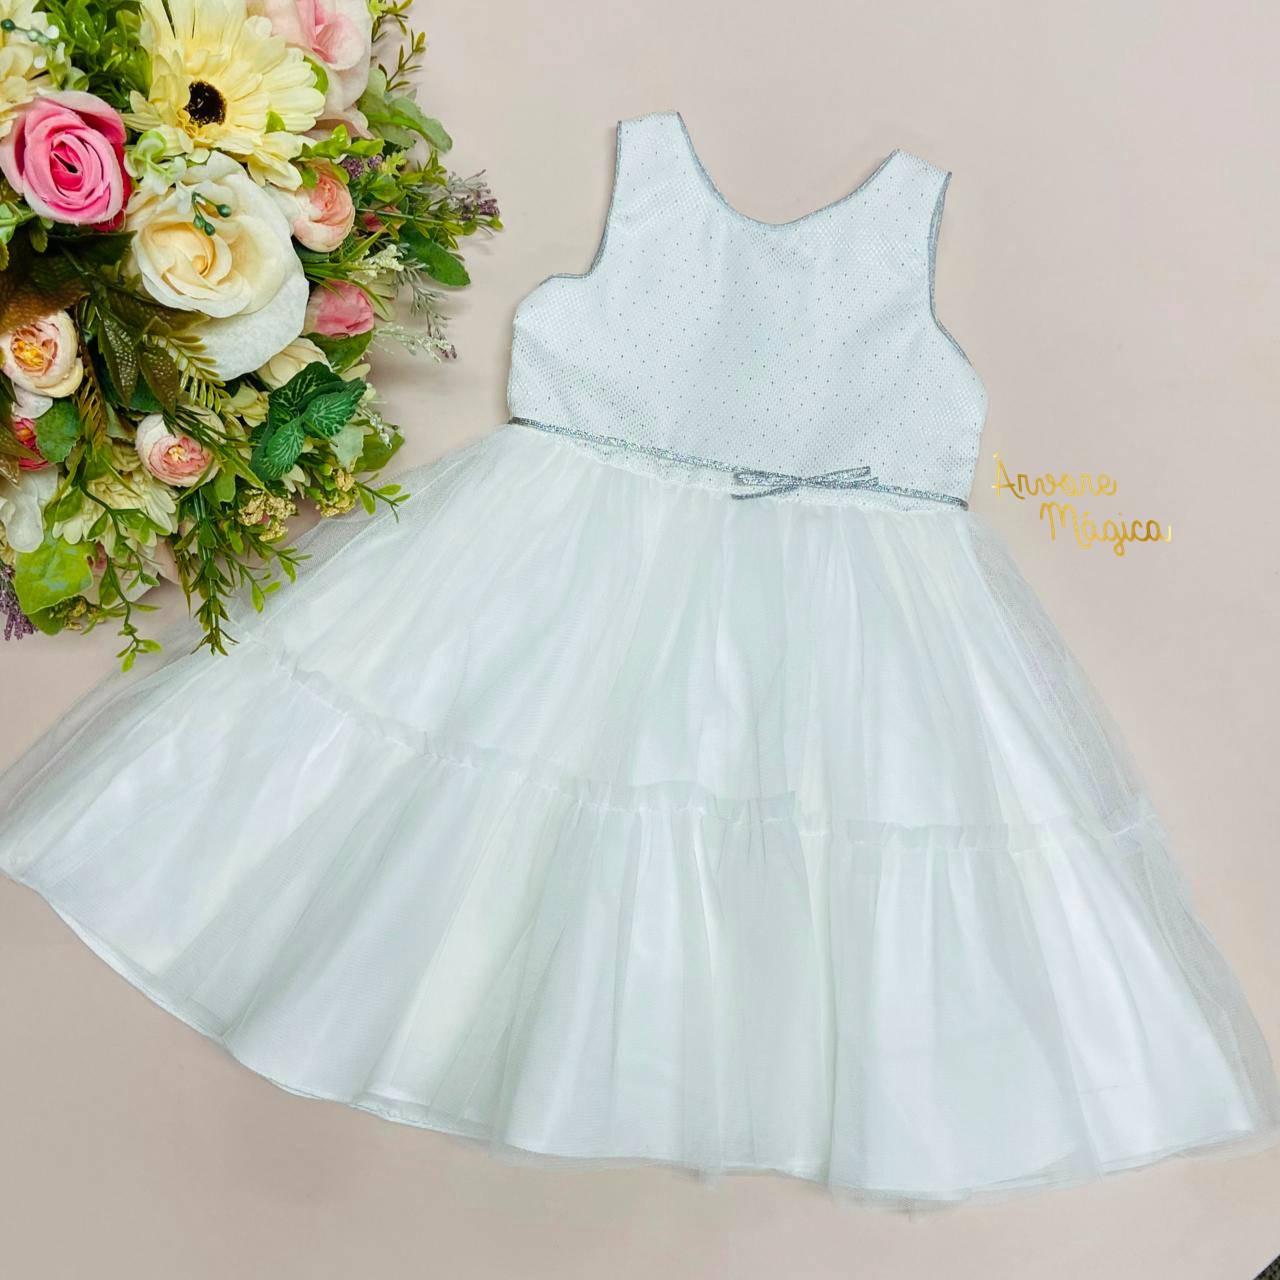 Vestido de Festa Infantil Valentina Tule Petit Cherie